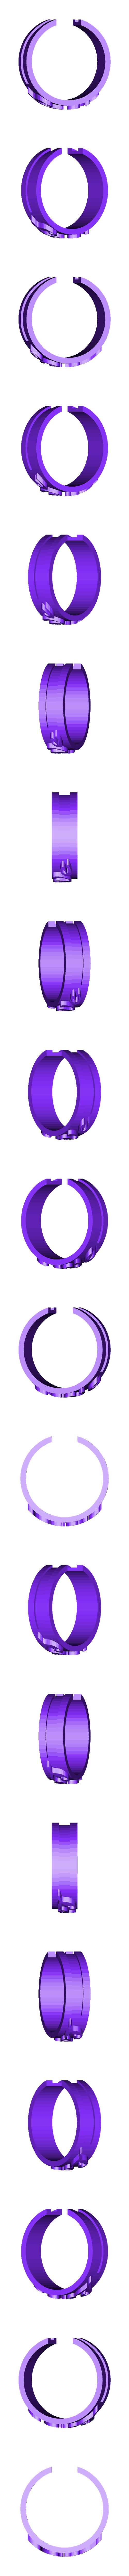 anillo love 21 abierto hendidura.stl Télécharger fichier STL gratuit Anillo / Ring Love • Design pour impression 3D, amg3D